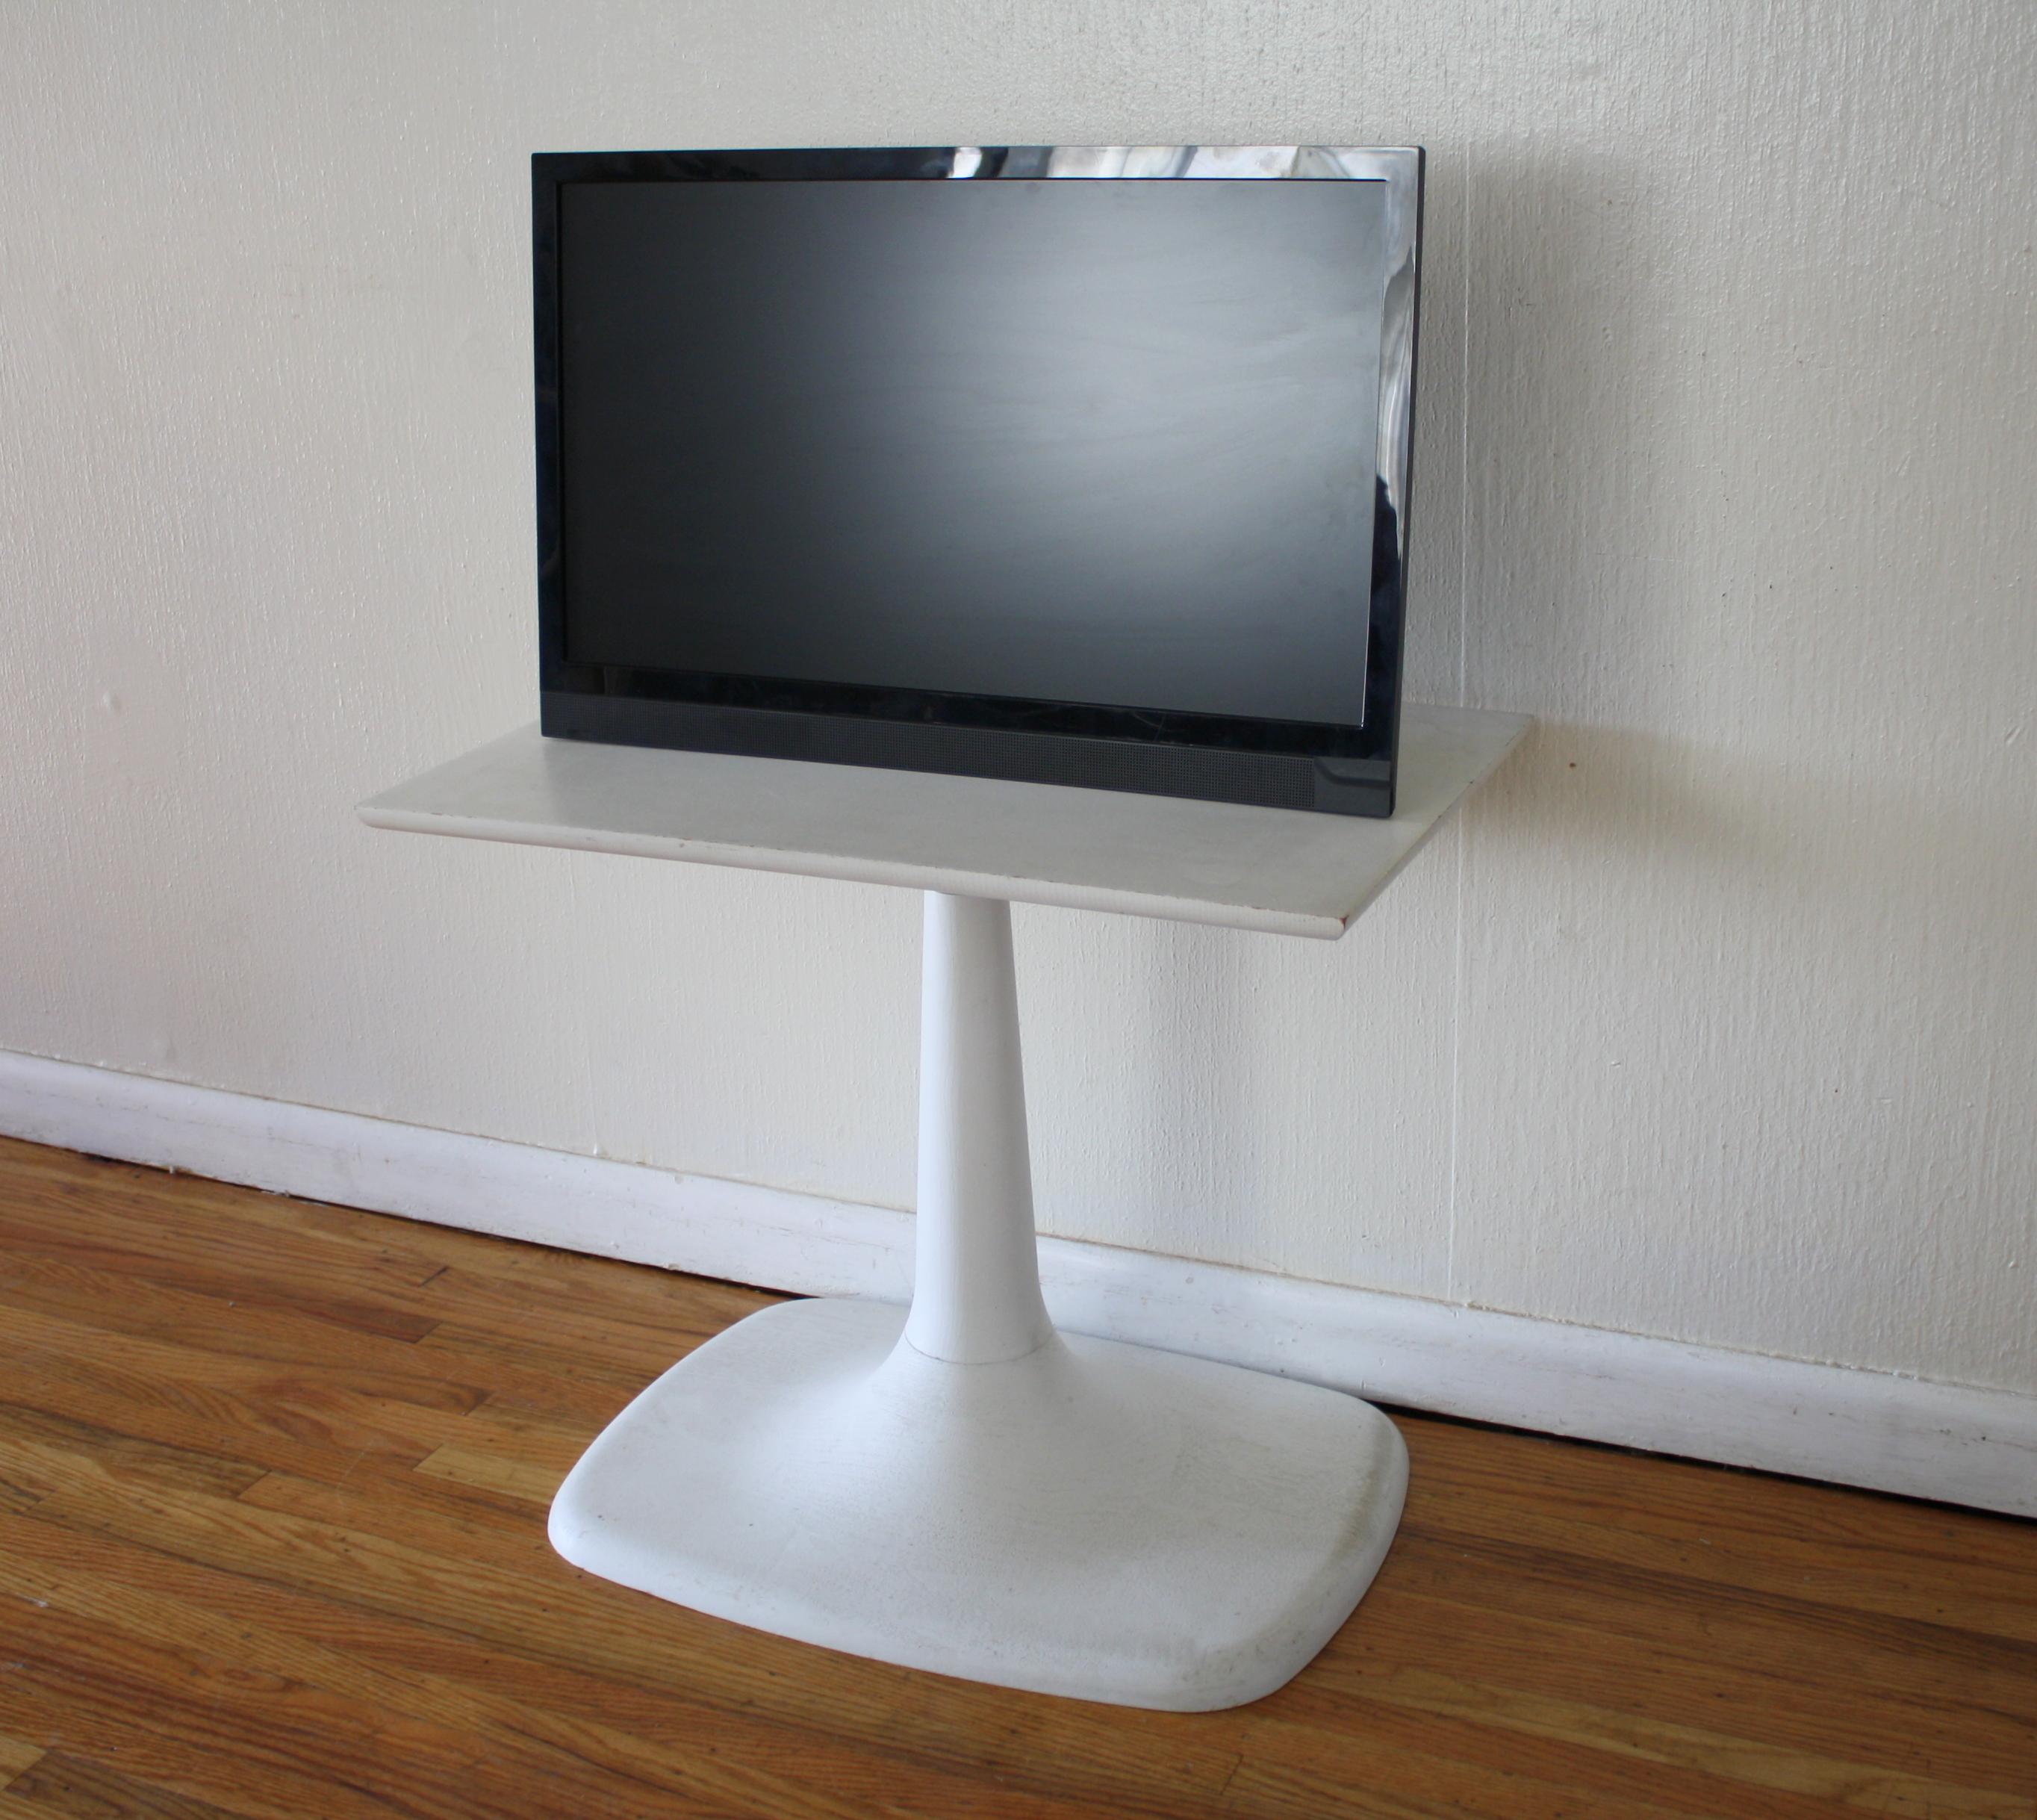 mcm tulip pedestal tv stand 2 Picked Vintage : mcm tulip pedestal tv stand 2 from pickedvintage.com size 2728 x 2437 jpeg 2200kB